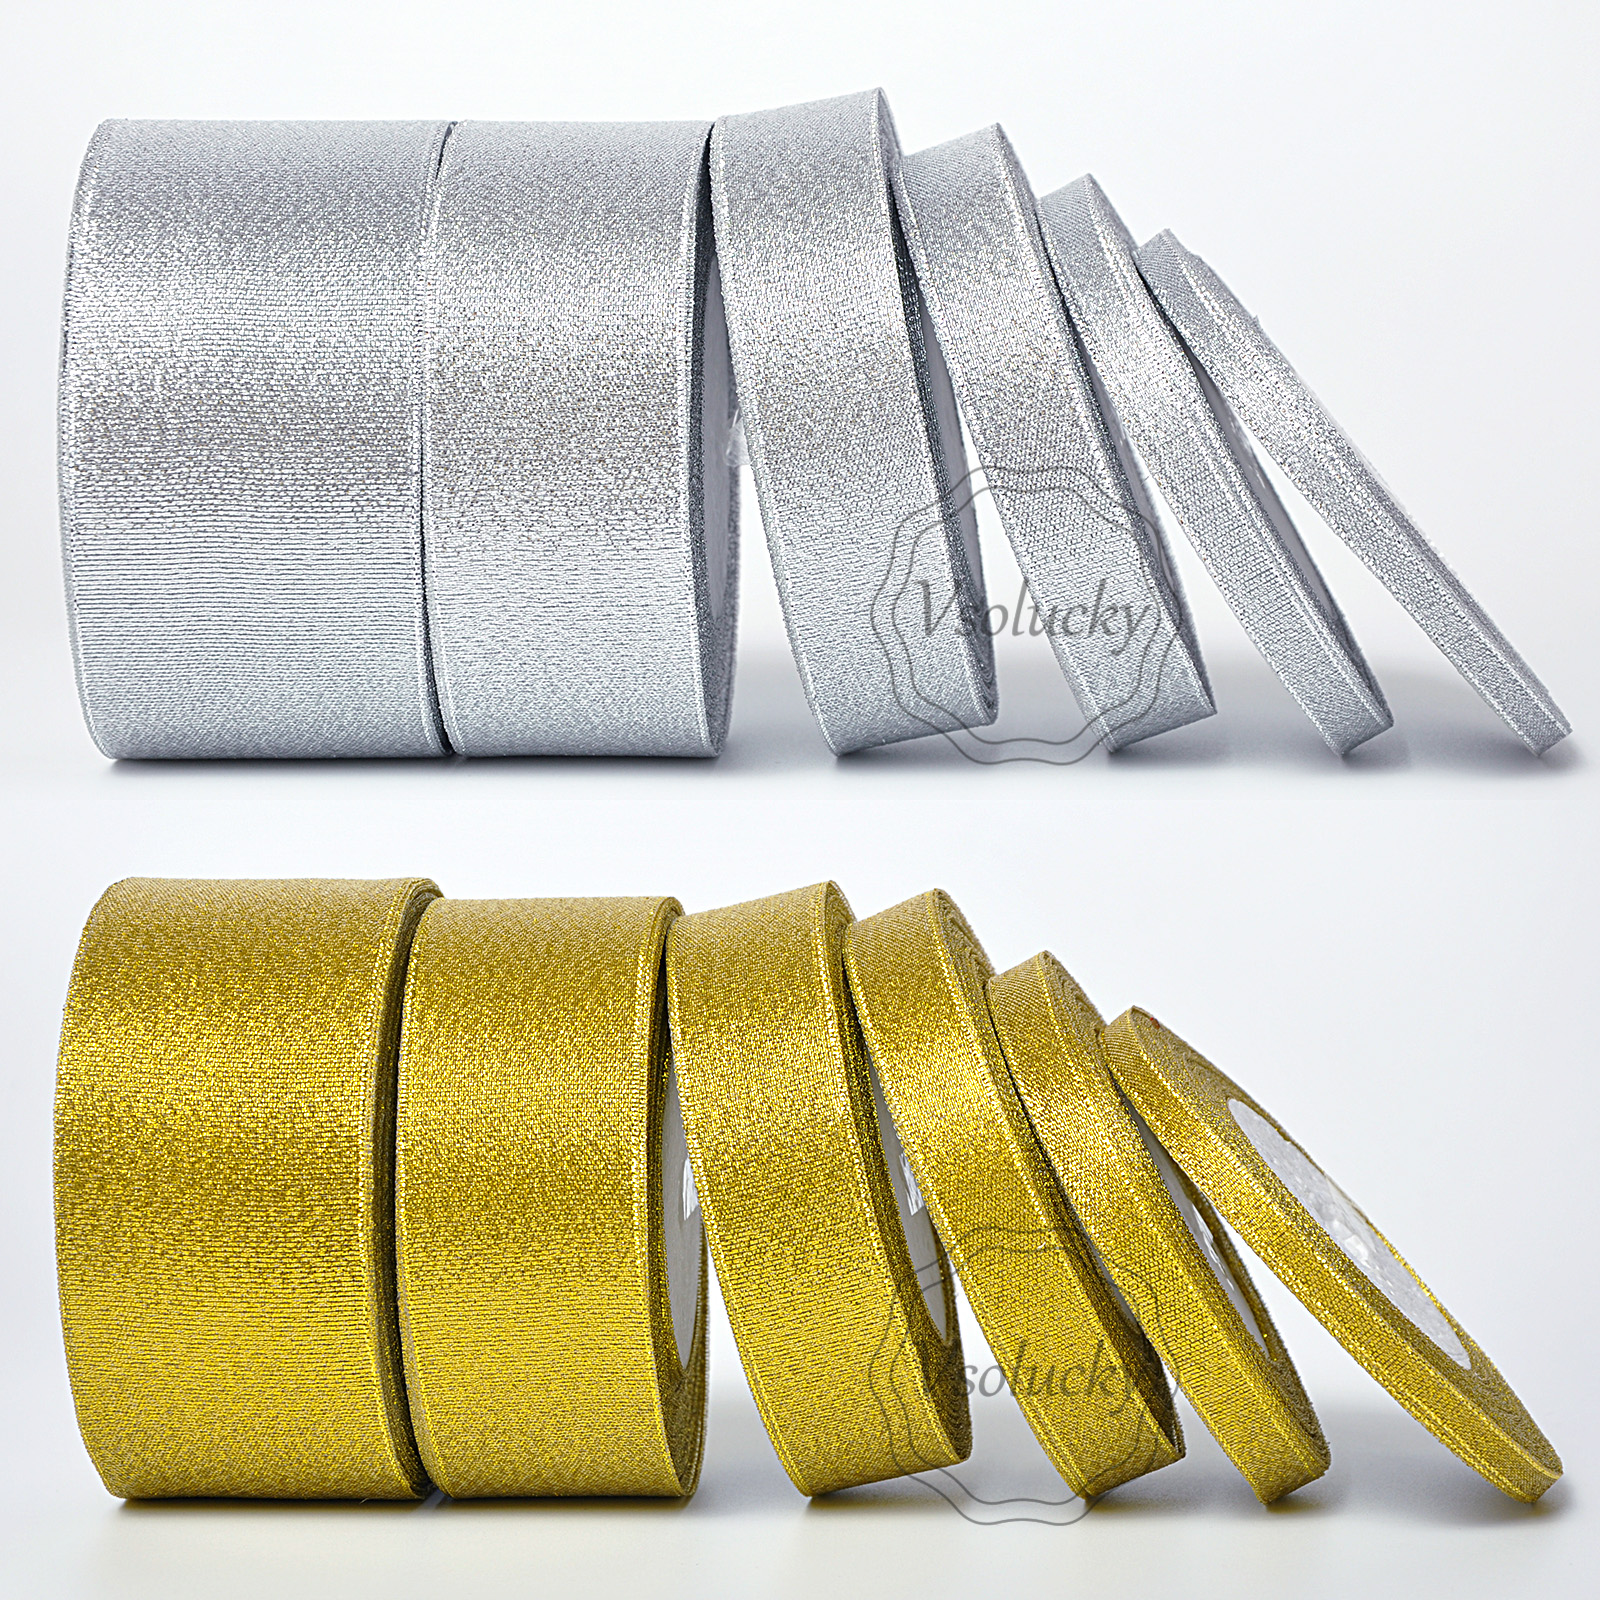 25mm large *** - *** gold organza ruban de NOEL